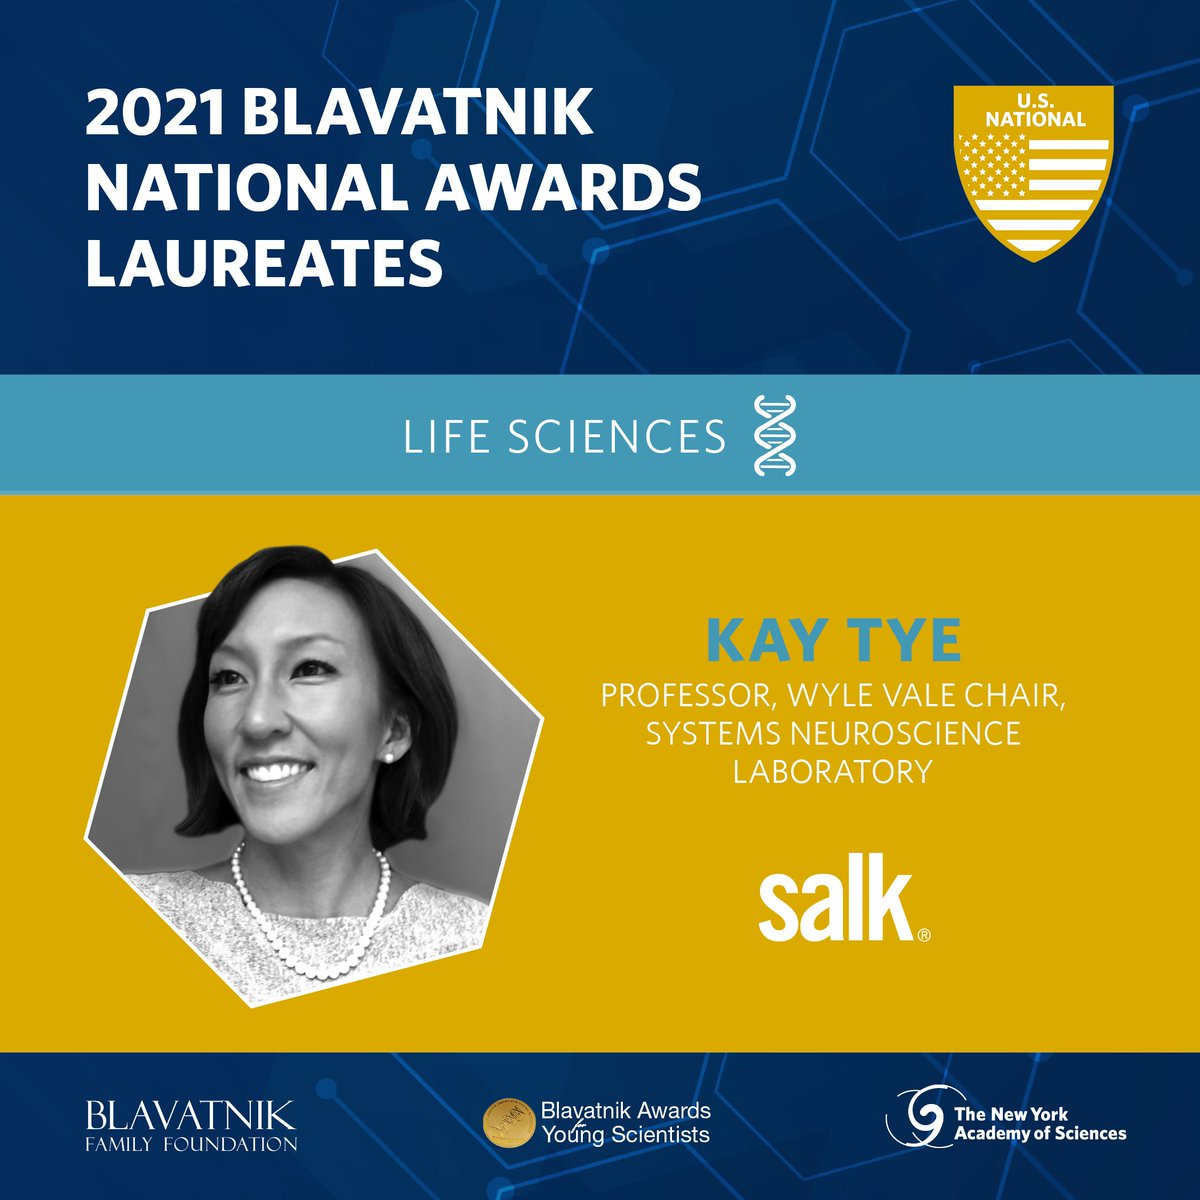 Congratulations to Salk Professor Kay Tye! One of three 2021 Blavatnik National Award Laureates! 🏆 #blavatnik2021